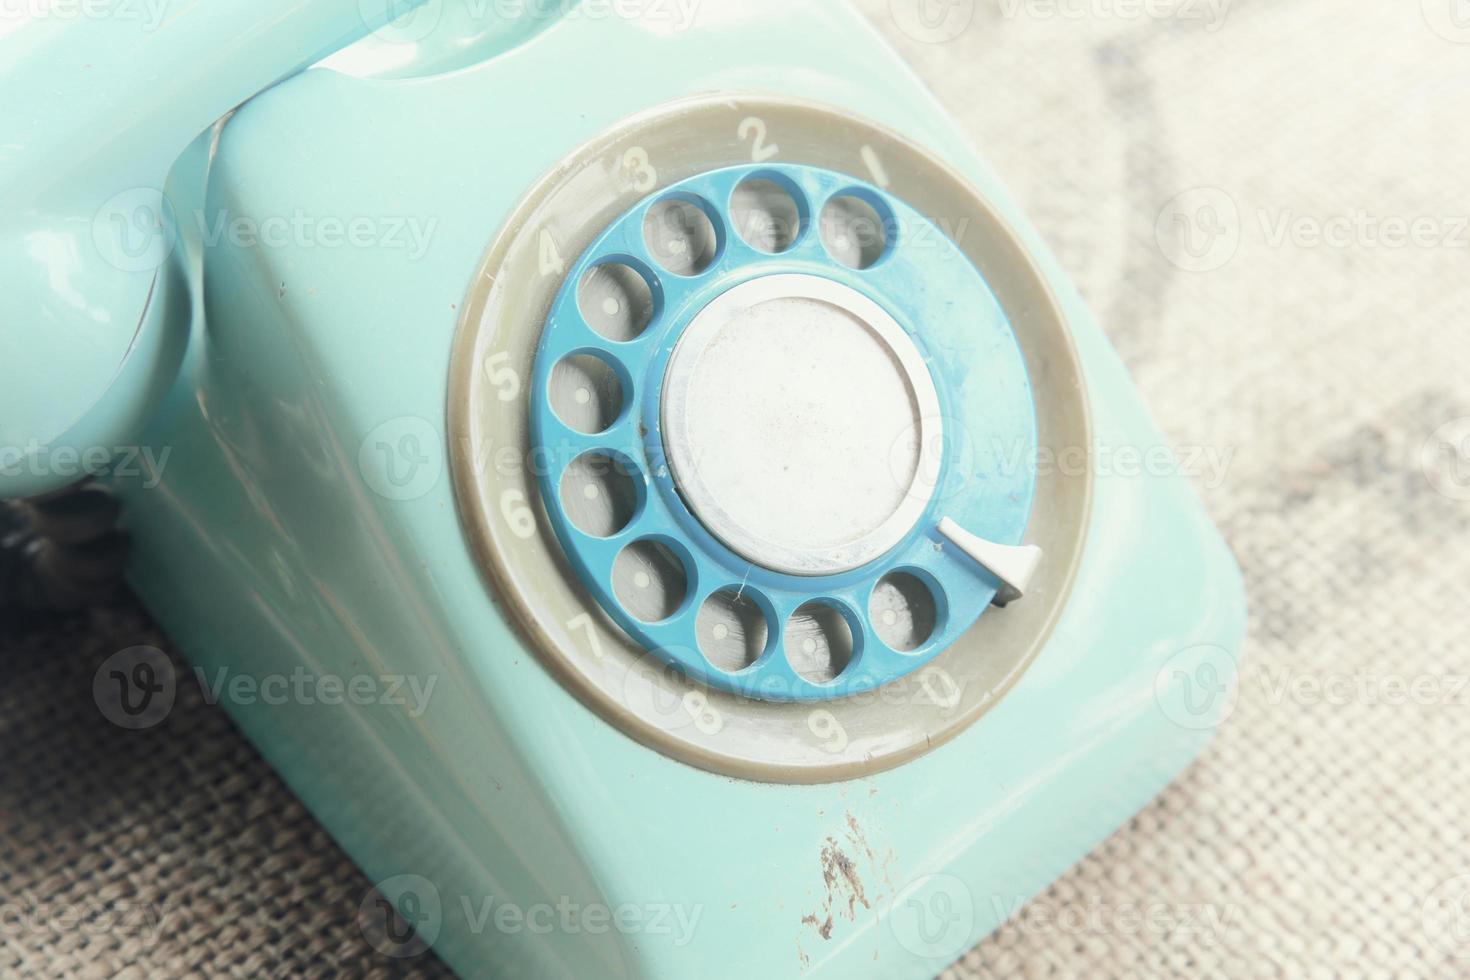 Teléfono rotatorio retro en textura de lino natural foto